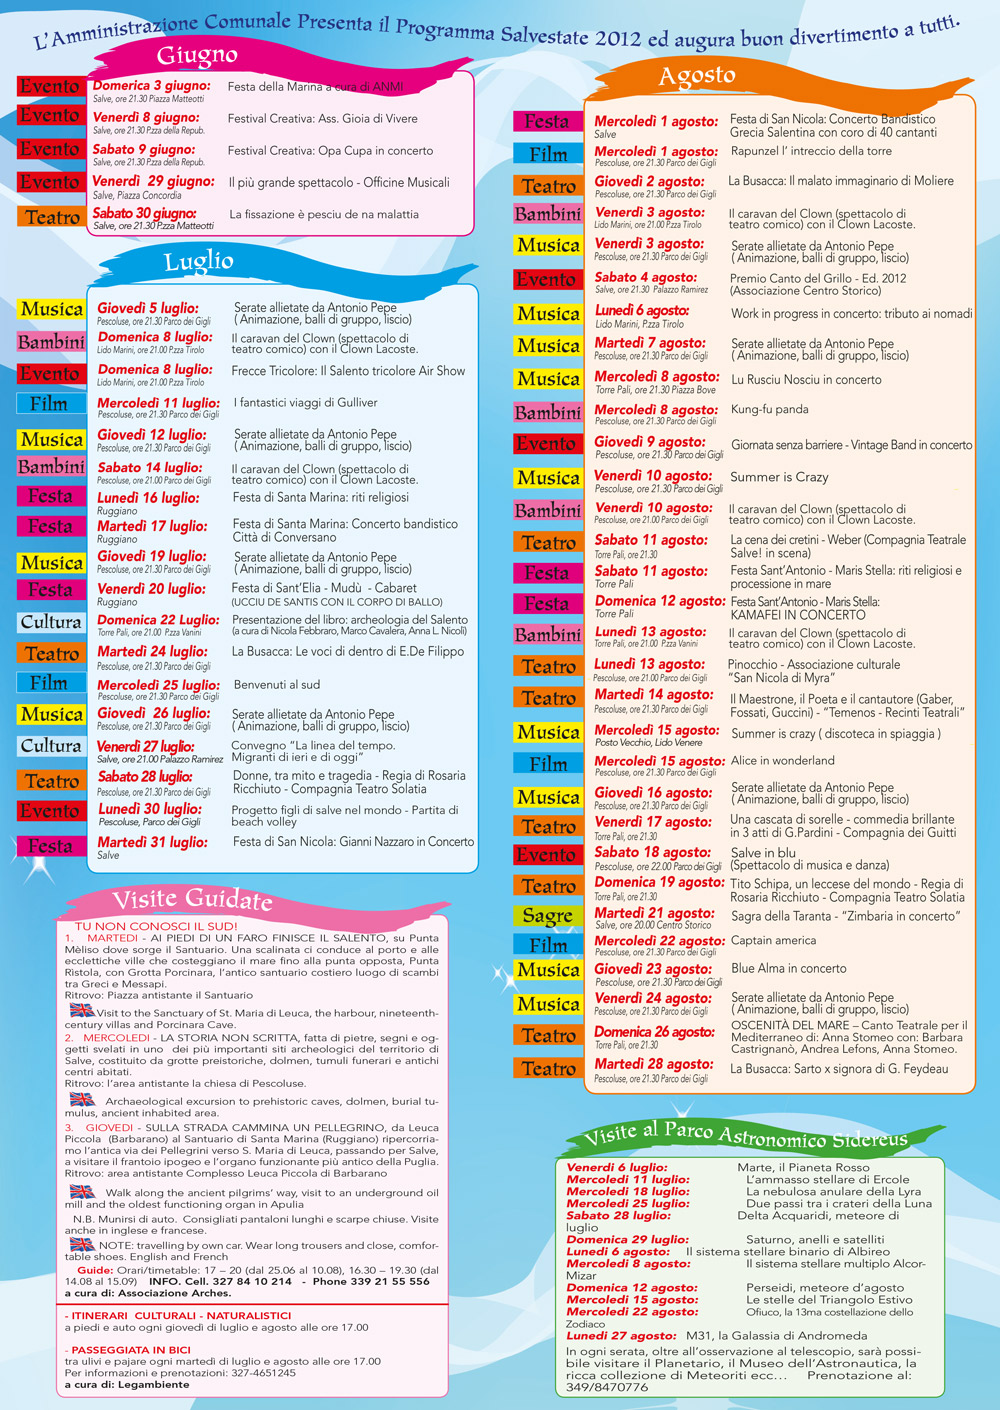 Tutti gli eventi Salvestate 2012